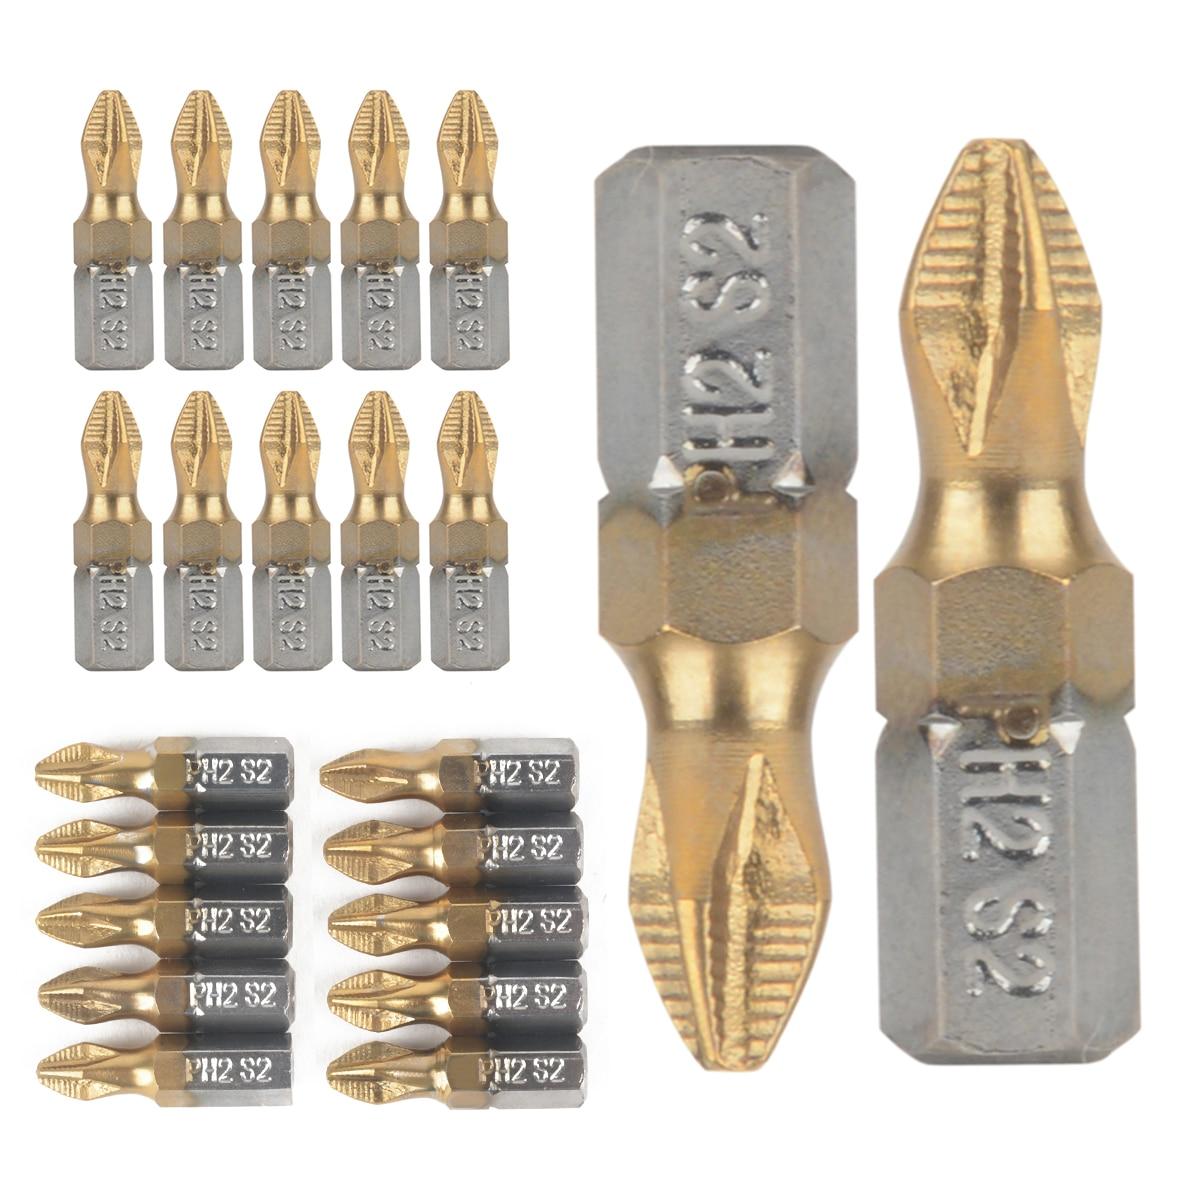 10pcs Anti Slip PH2 Screwdriver Bit 25mm Length 1/4